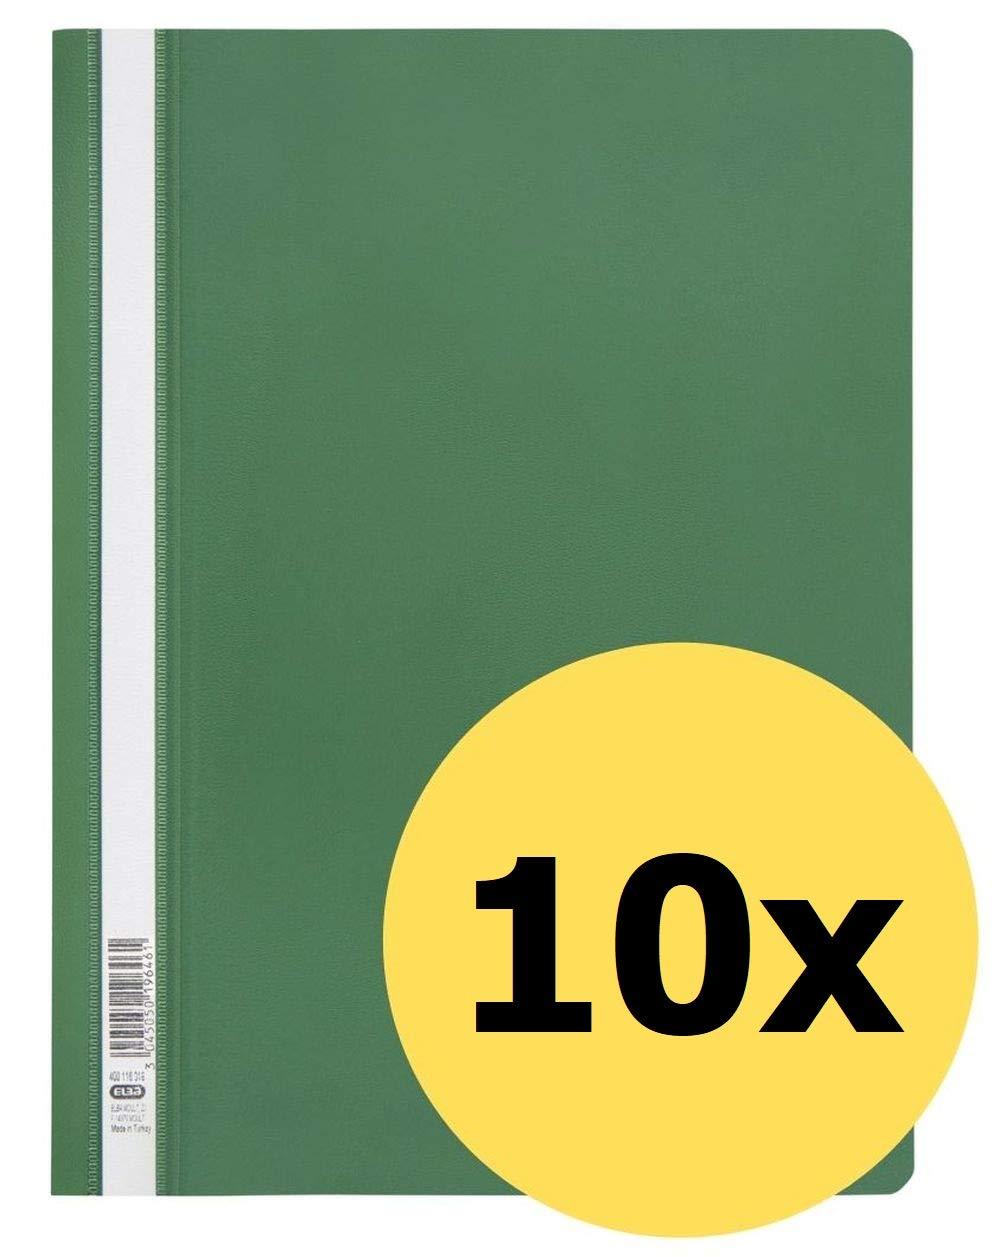 ELBA 100742145 Schnellhefter A4 10er Pack aus Kunststoff f/ür ca 160 DIN A4-Bl/ätter in orange